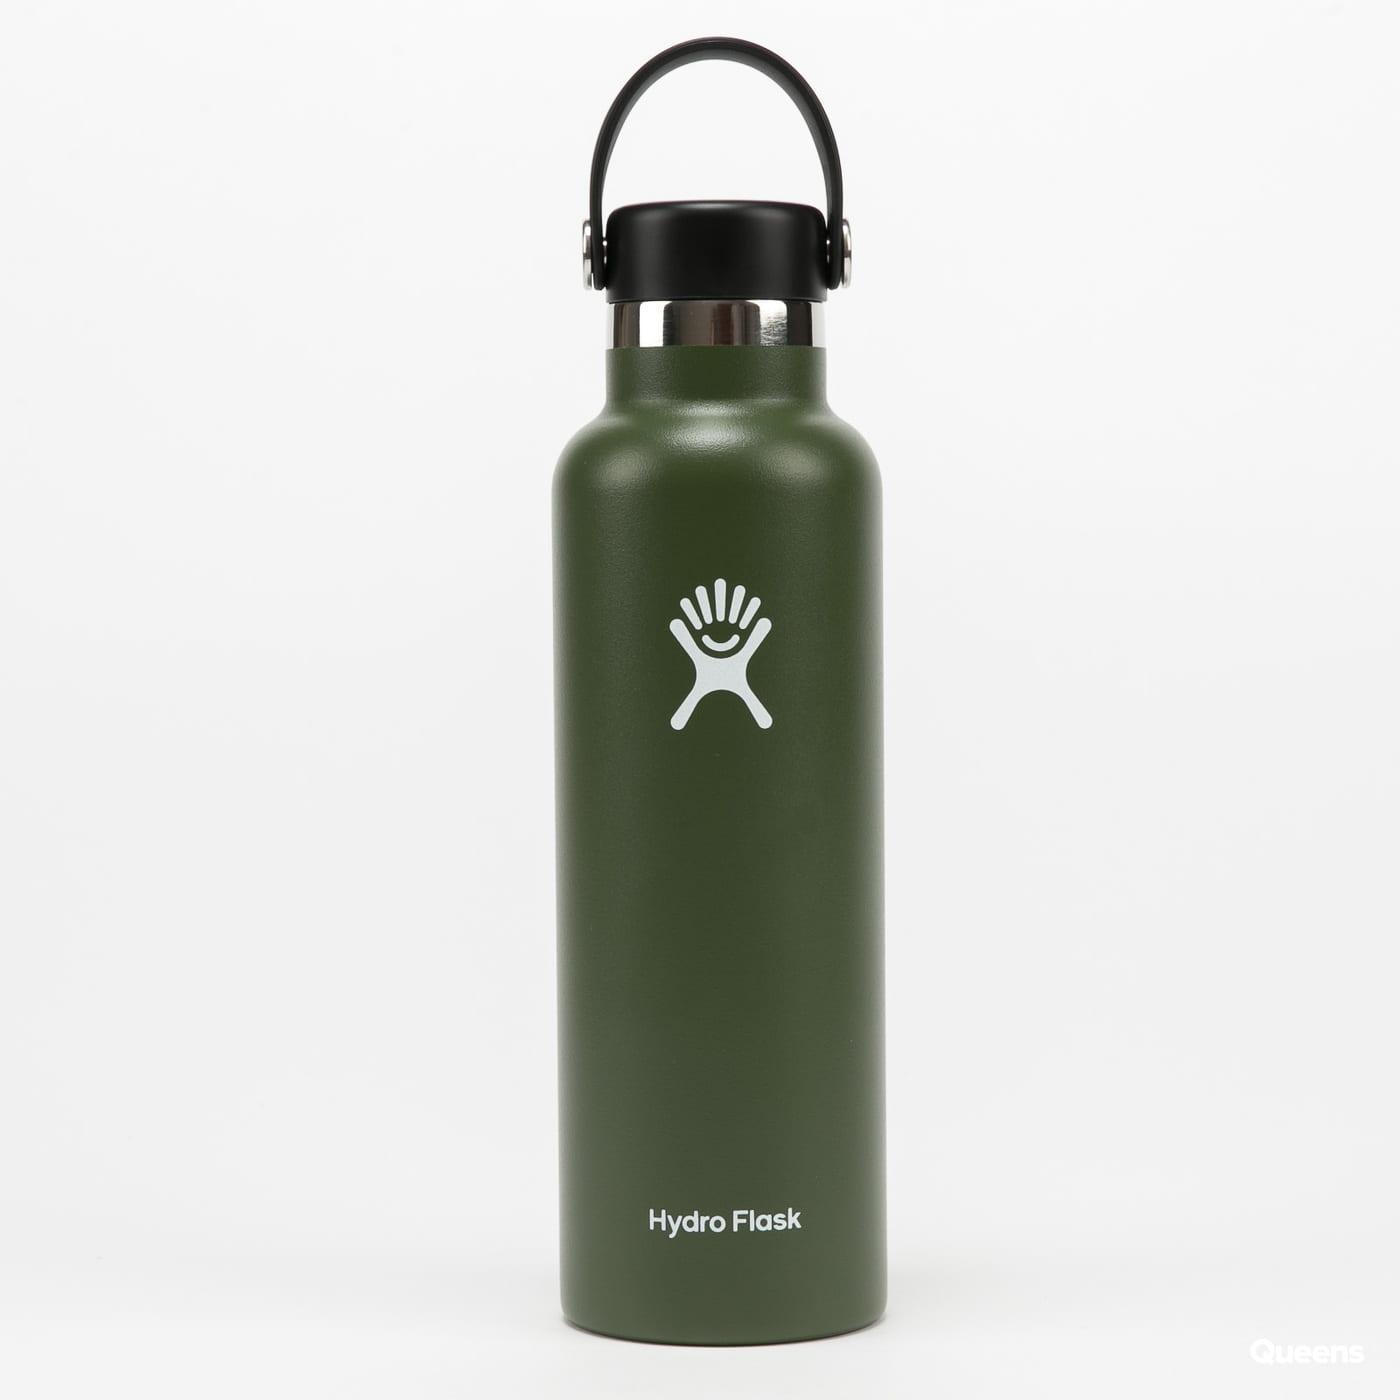 Hydro Flask Standard Mouth Flex Cap (621ml) olive / black